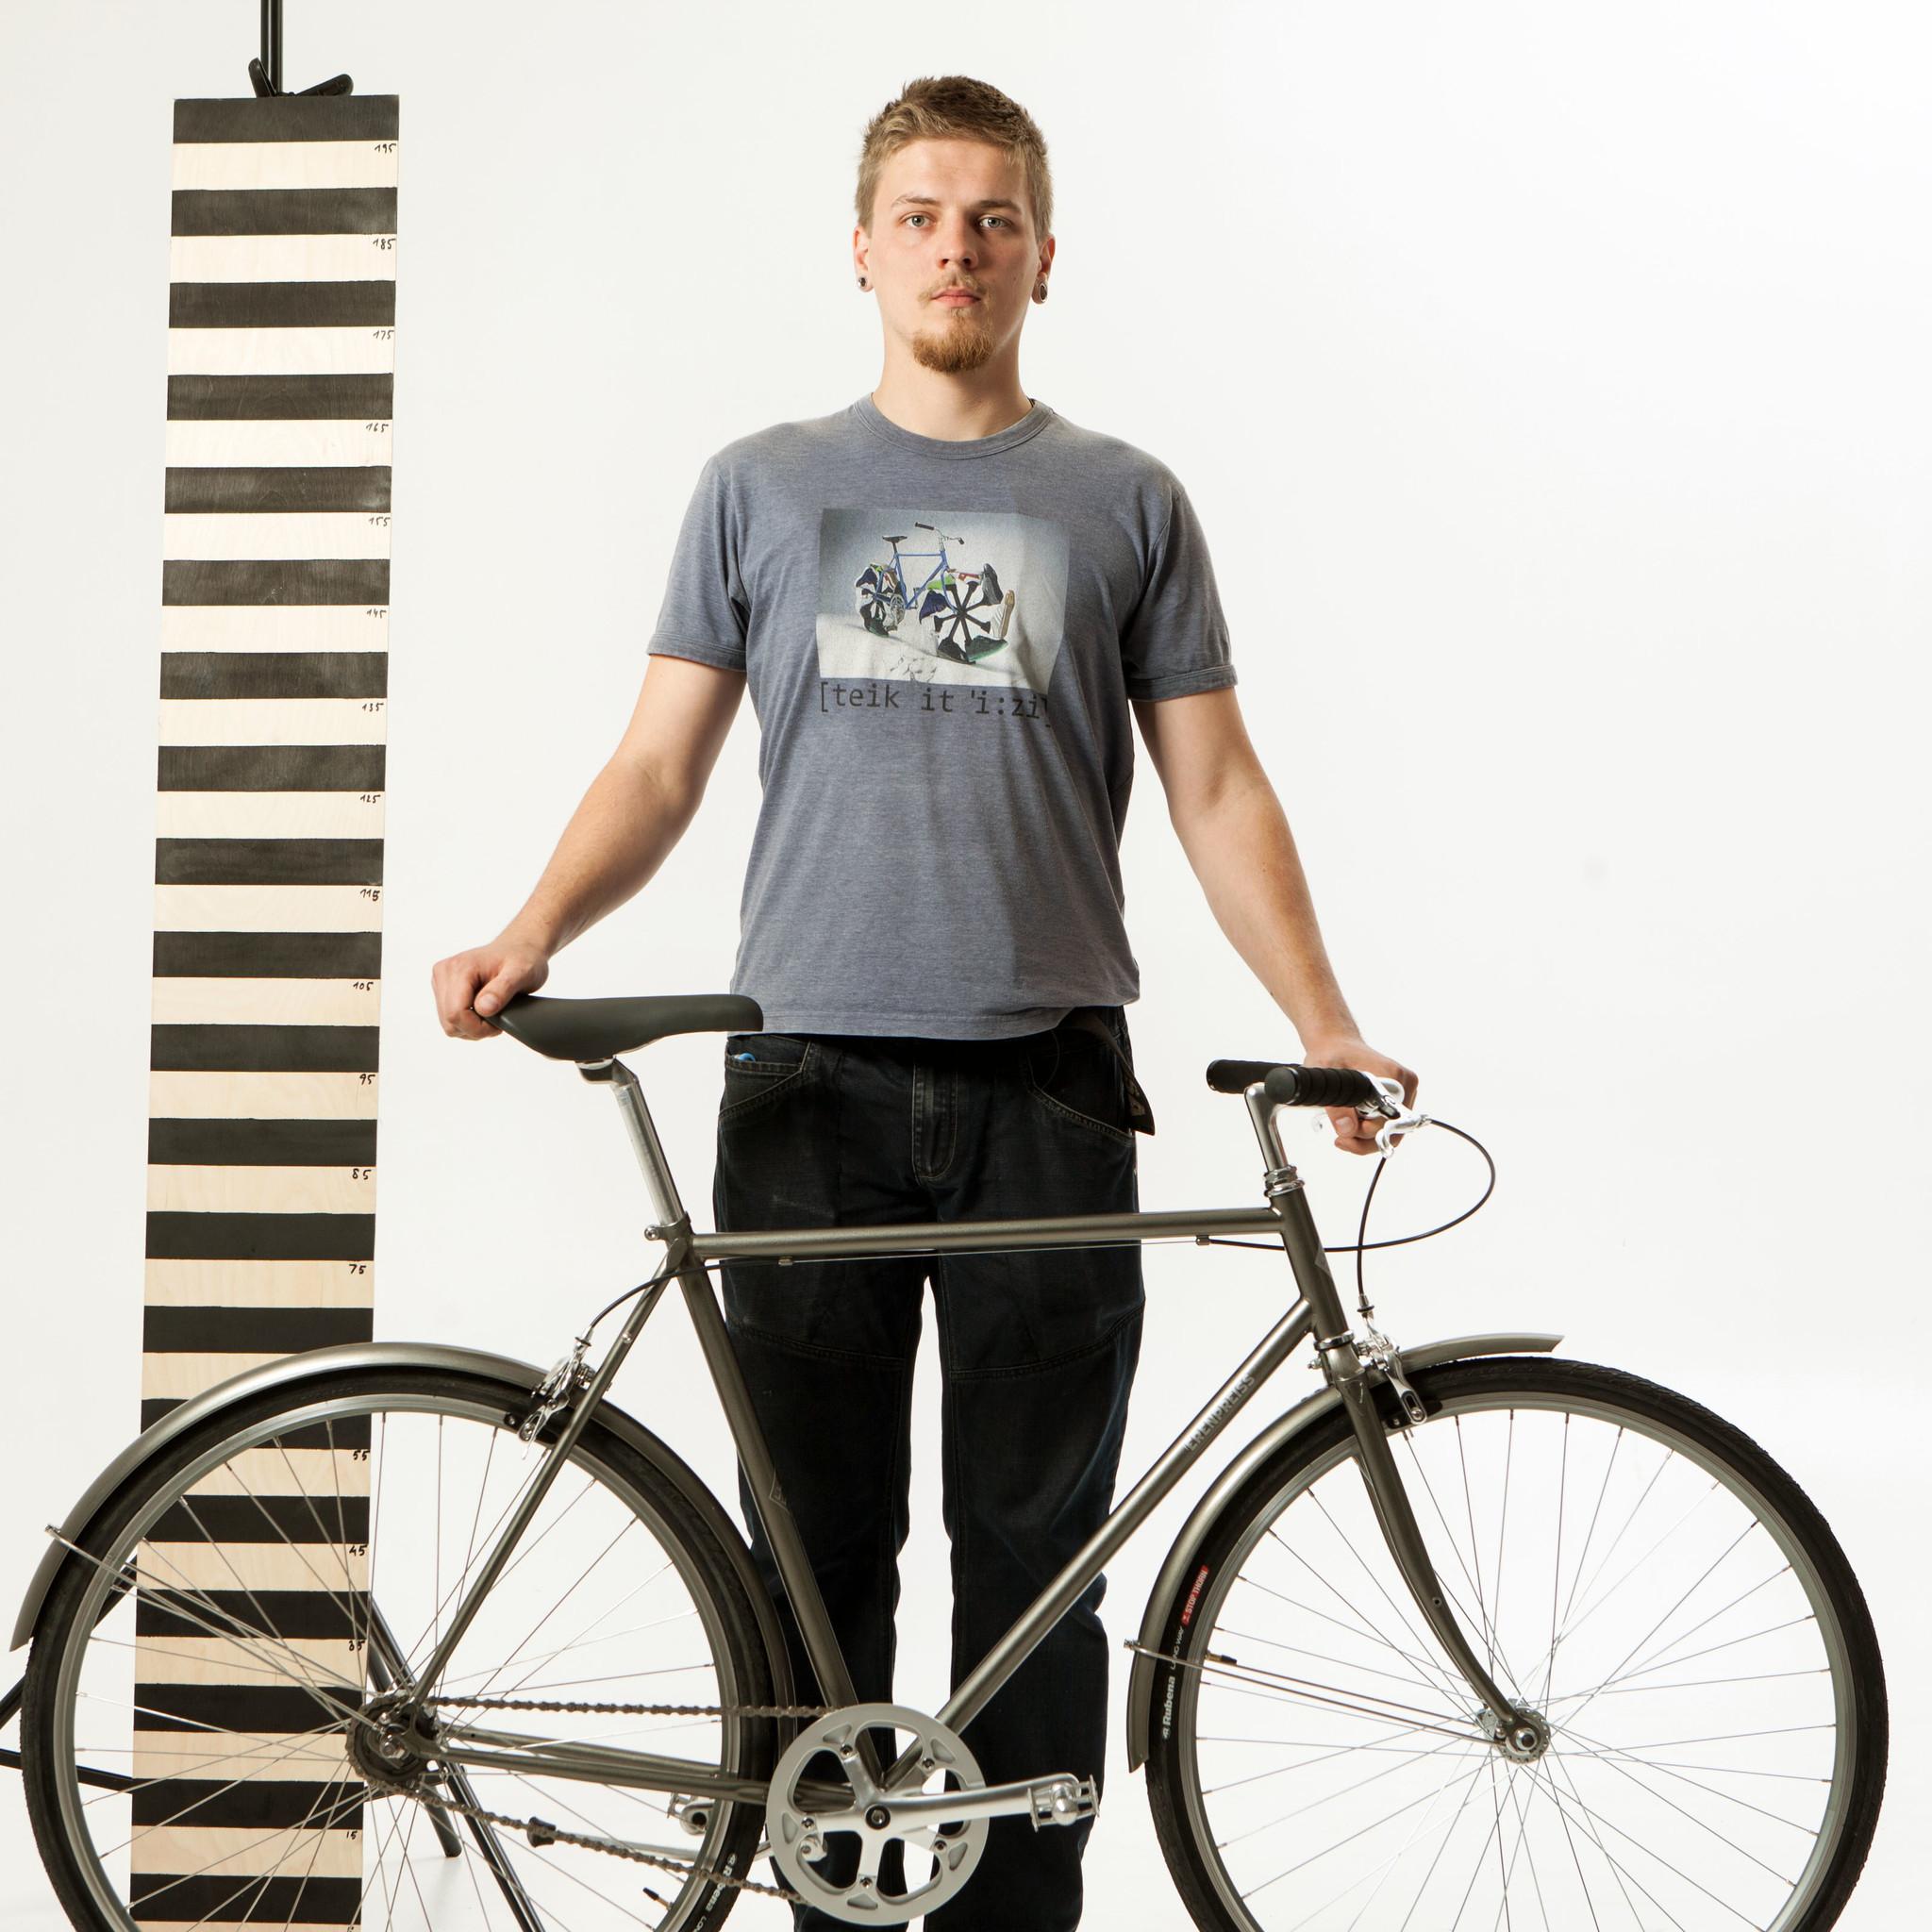 Choosing the correct bike size